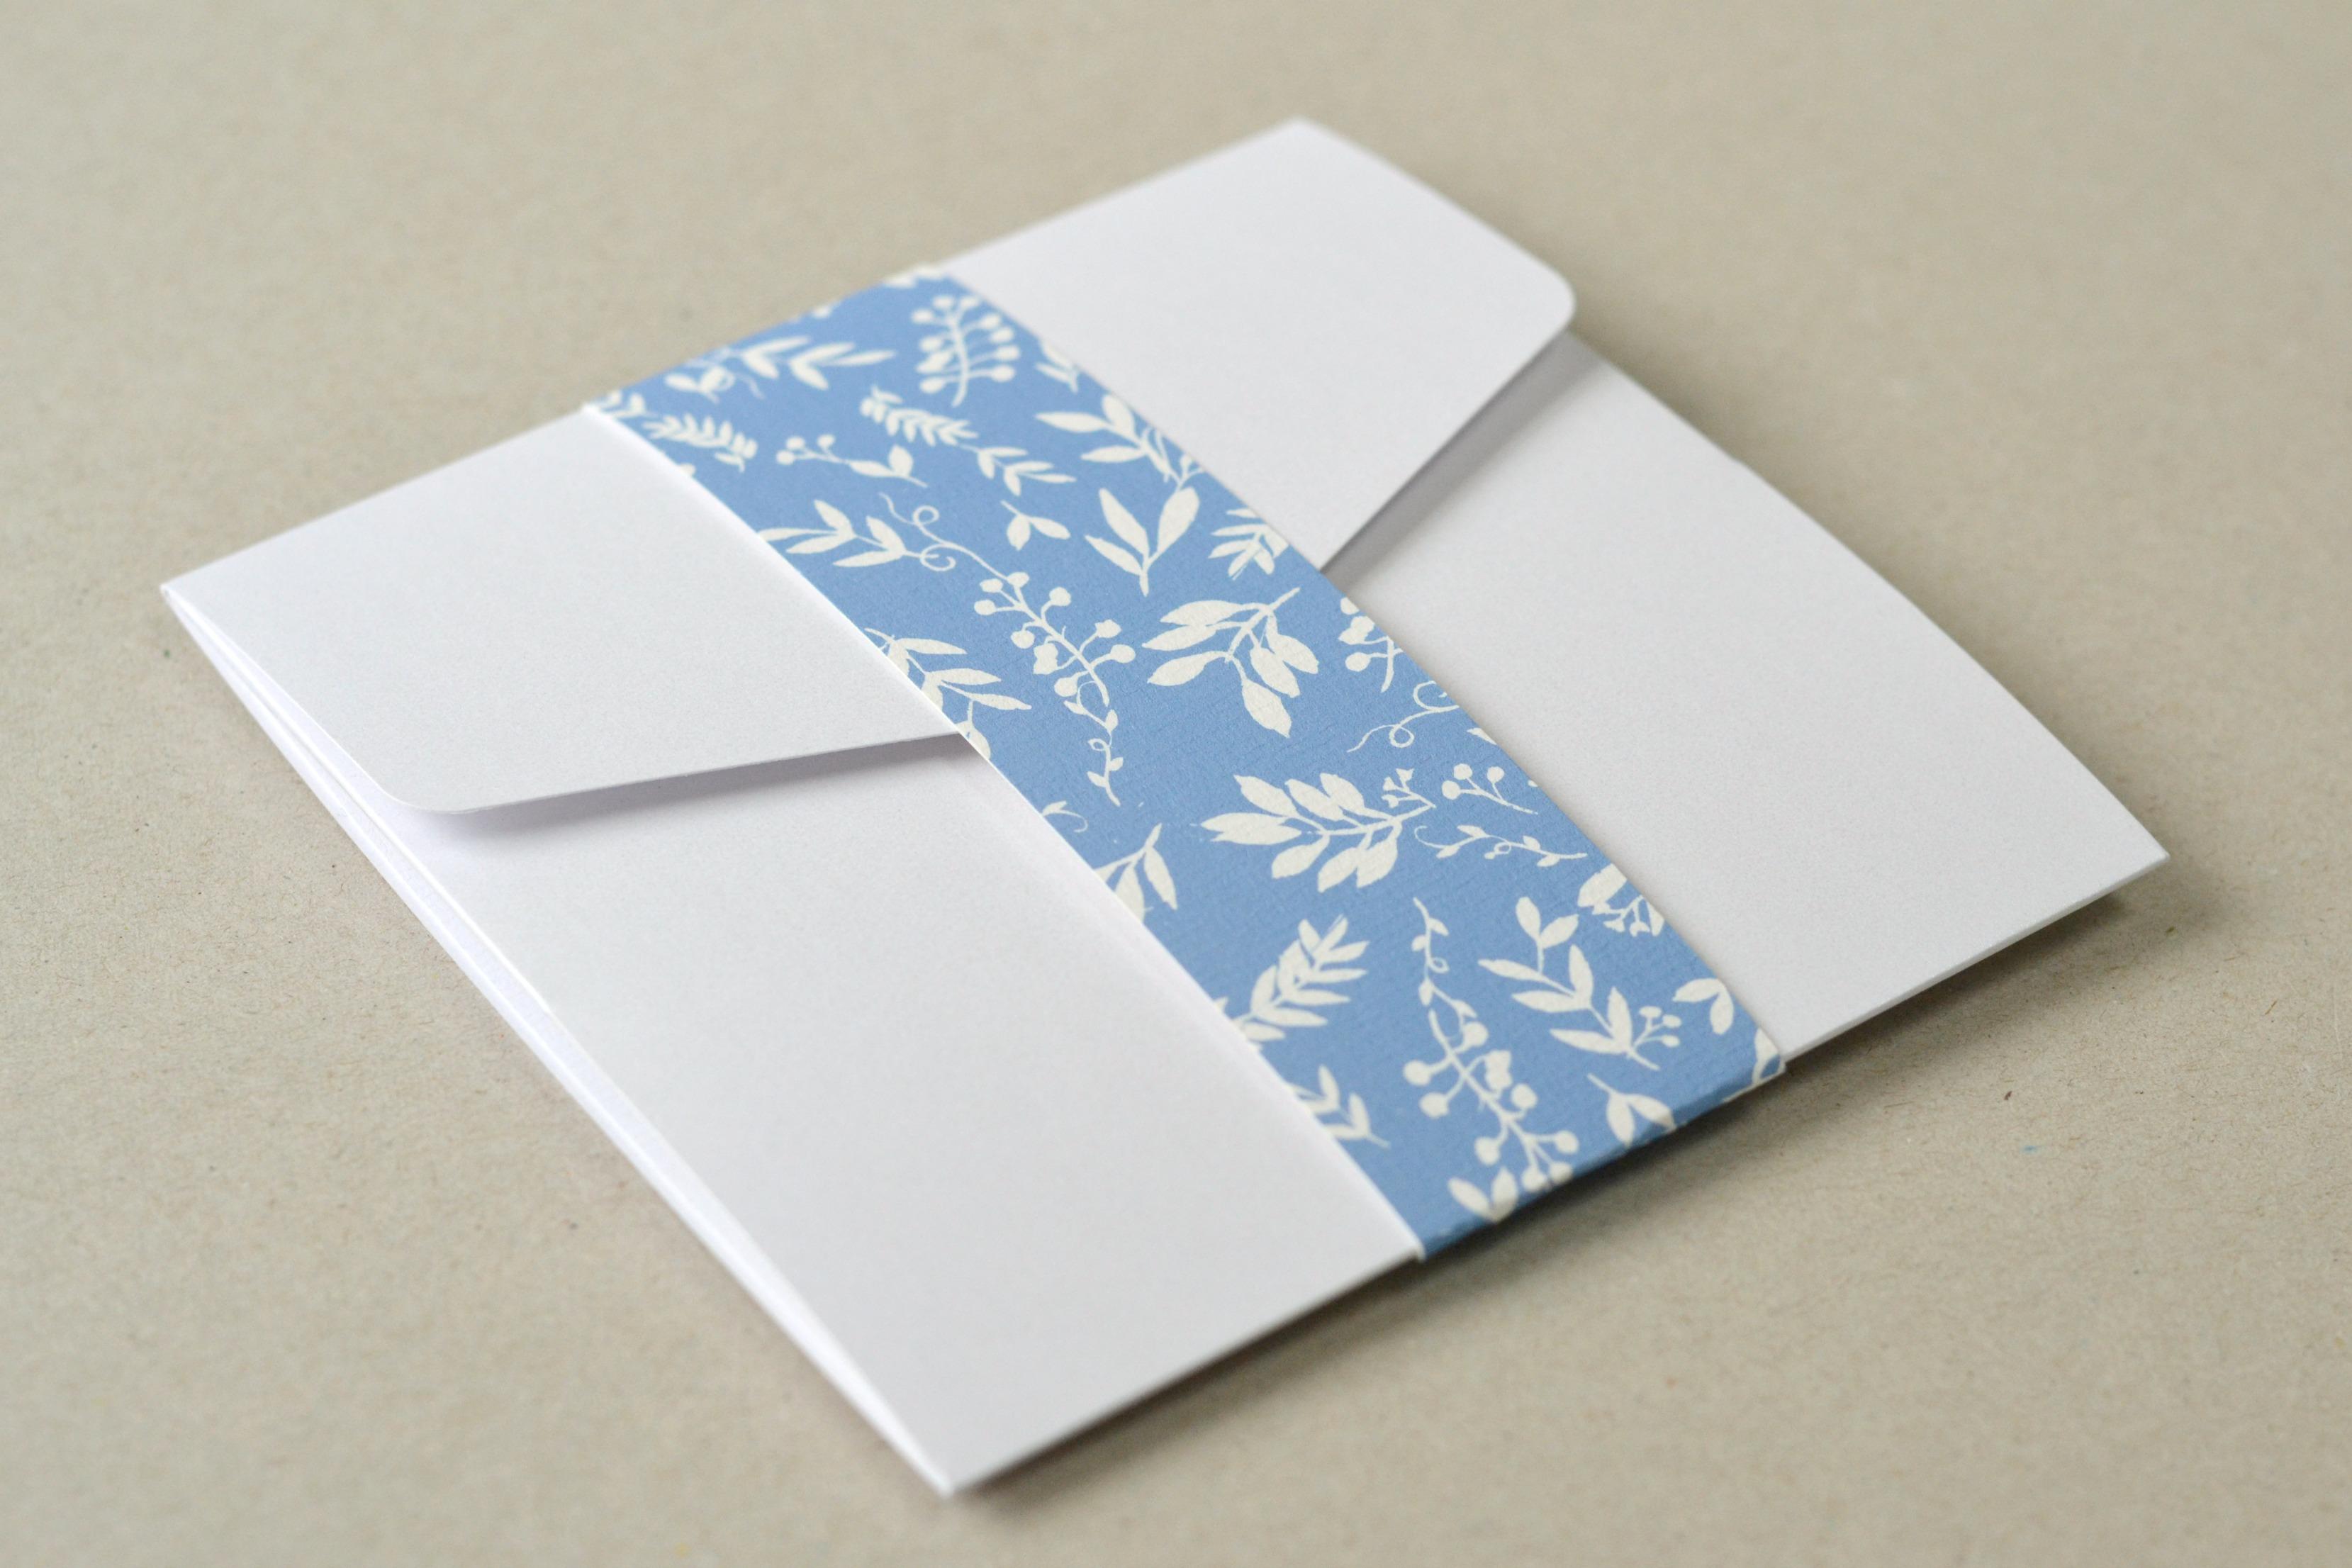 Cornflower Blue country wreath wedding invitations